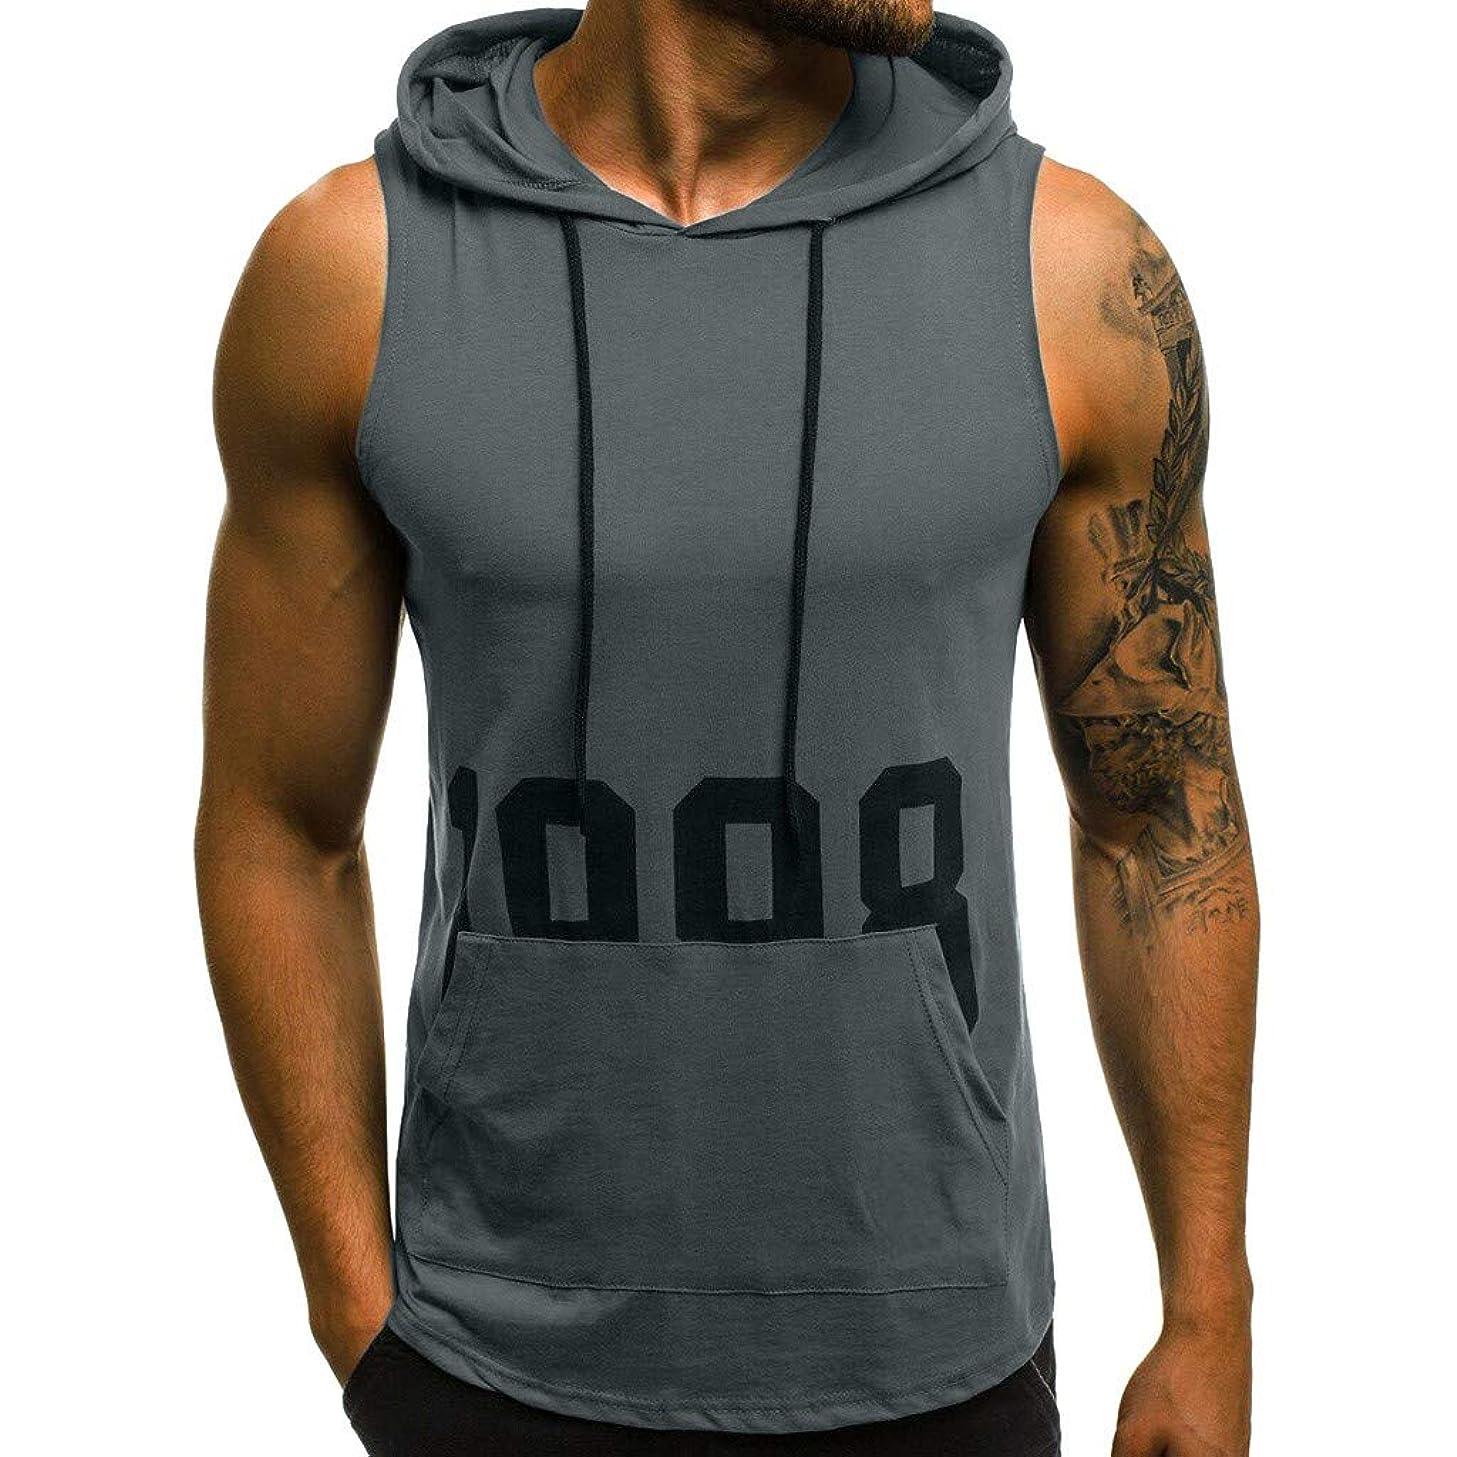 GONKOMA Men's Tank Tops Men Casual Fitness Muscle Print Sleeveless Hooded Bodybuilding Slim Fit Tops